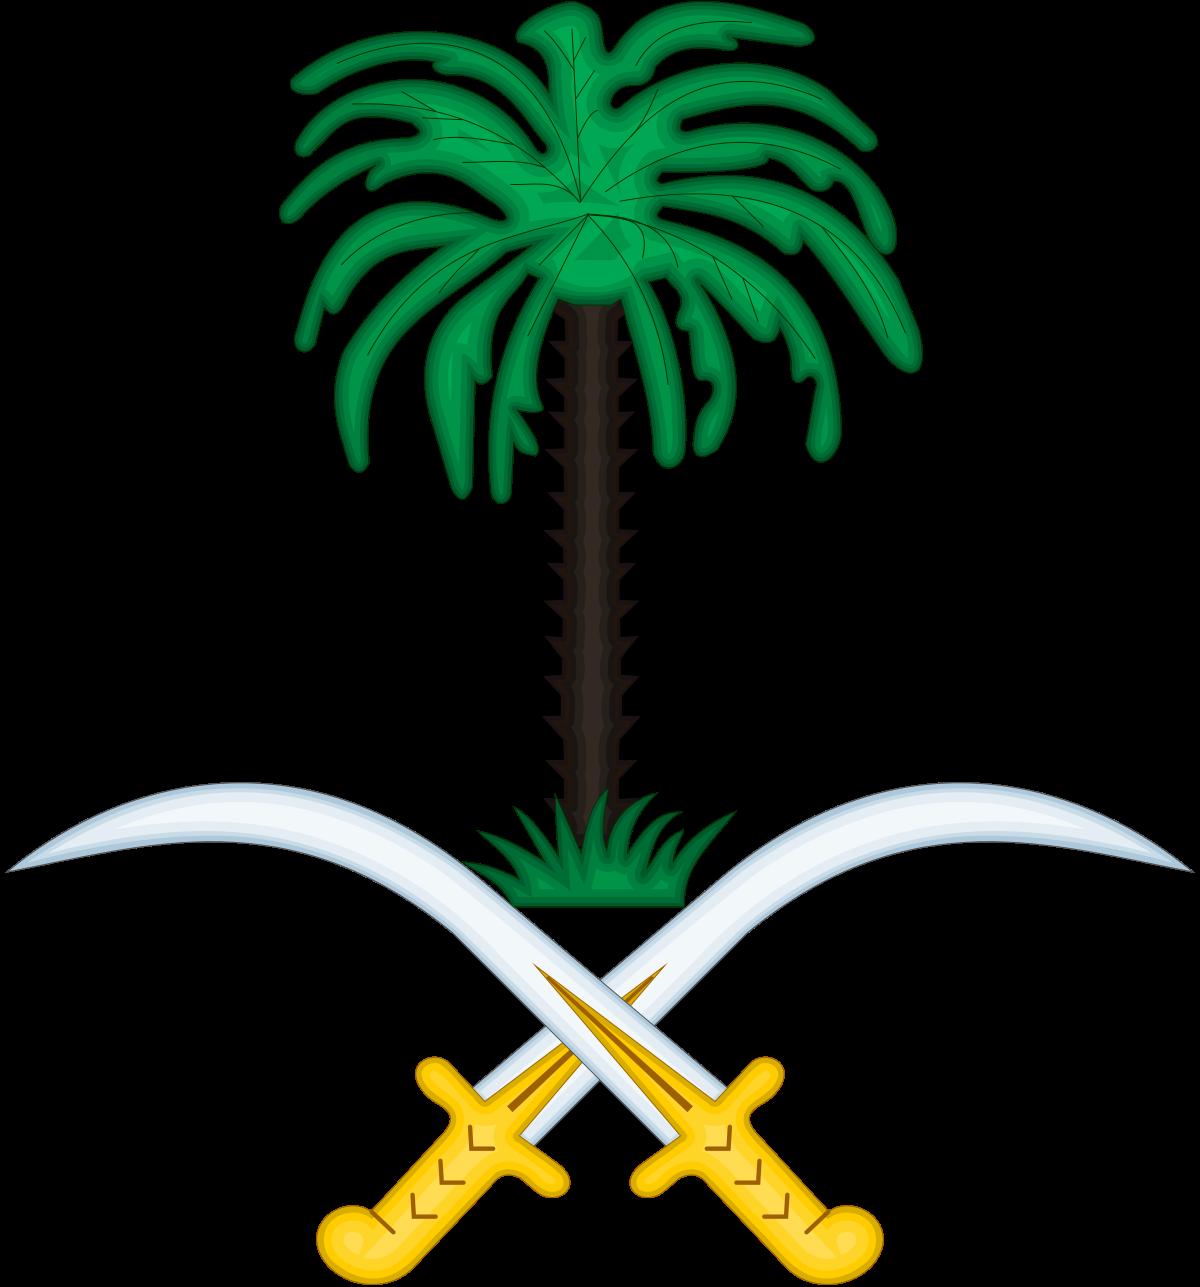 png free Checks and balances clipart pan. Politics of saudi arabia.